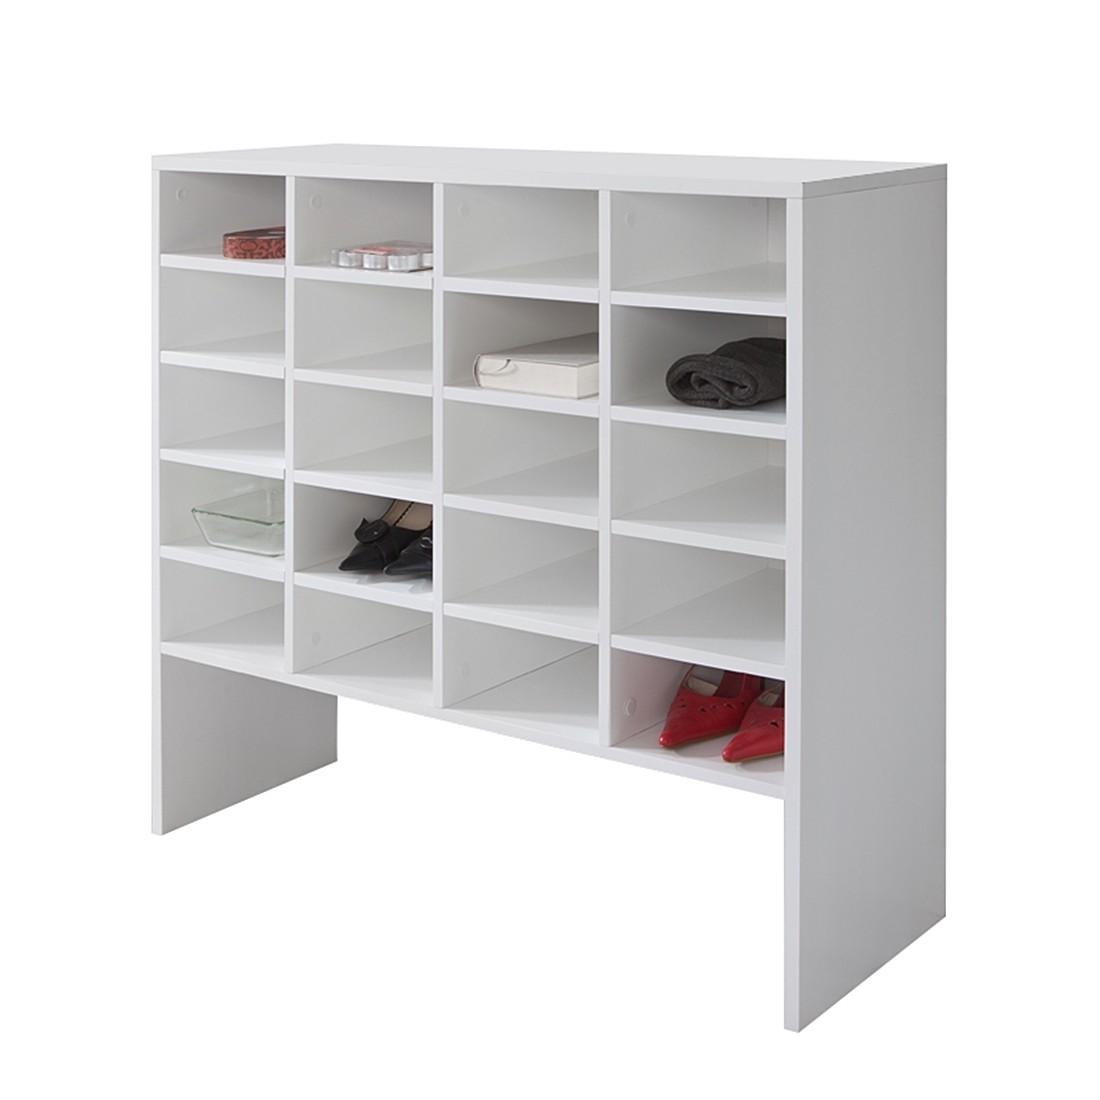 regal 20 cm breit sonstige preisvergleiche. Black Bedroom Furniture Sets. Home Design Ideas